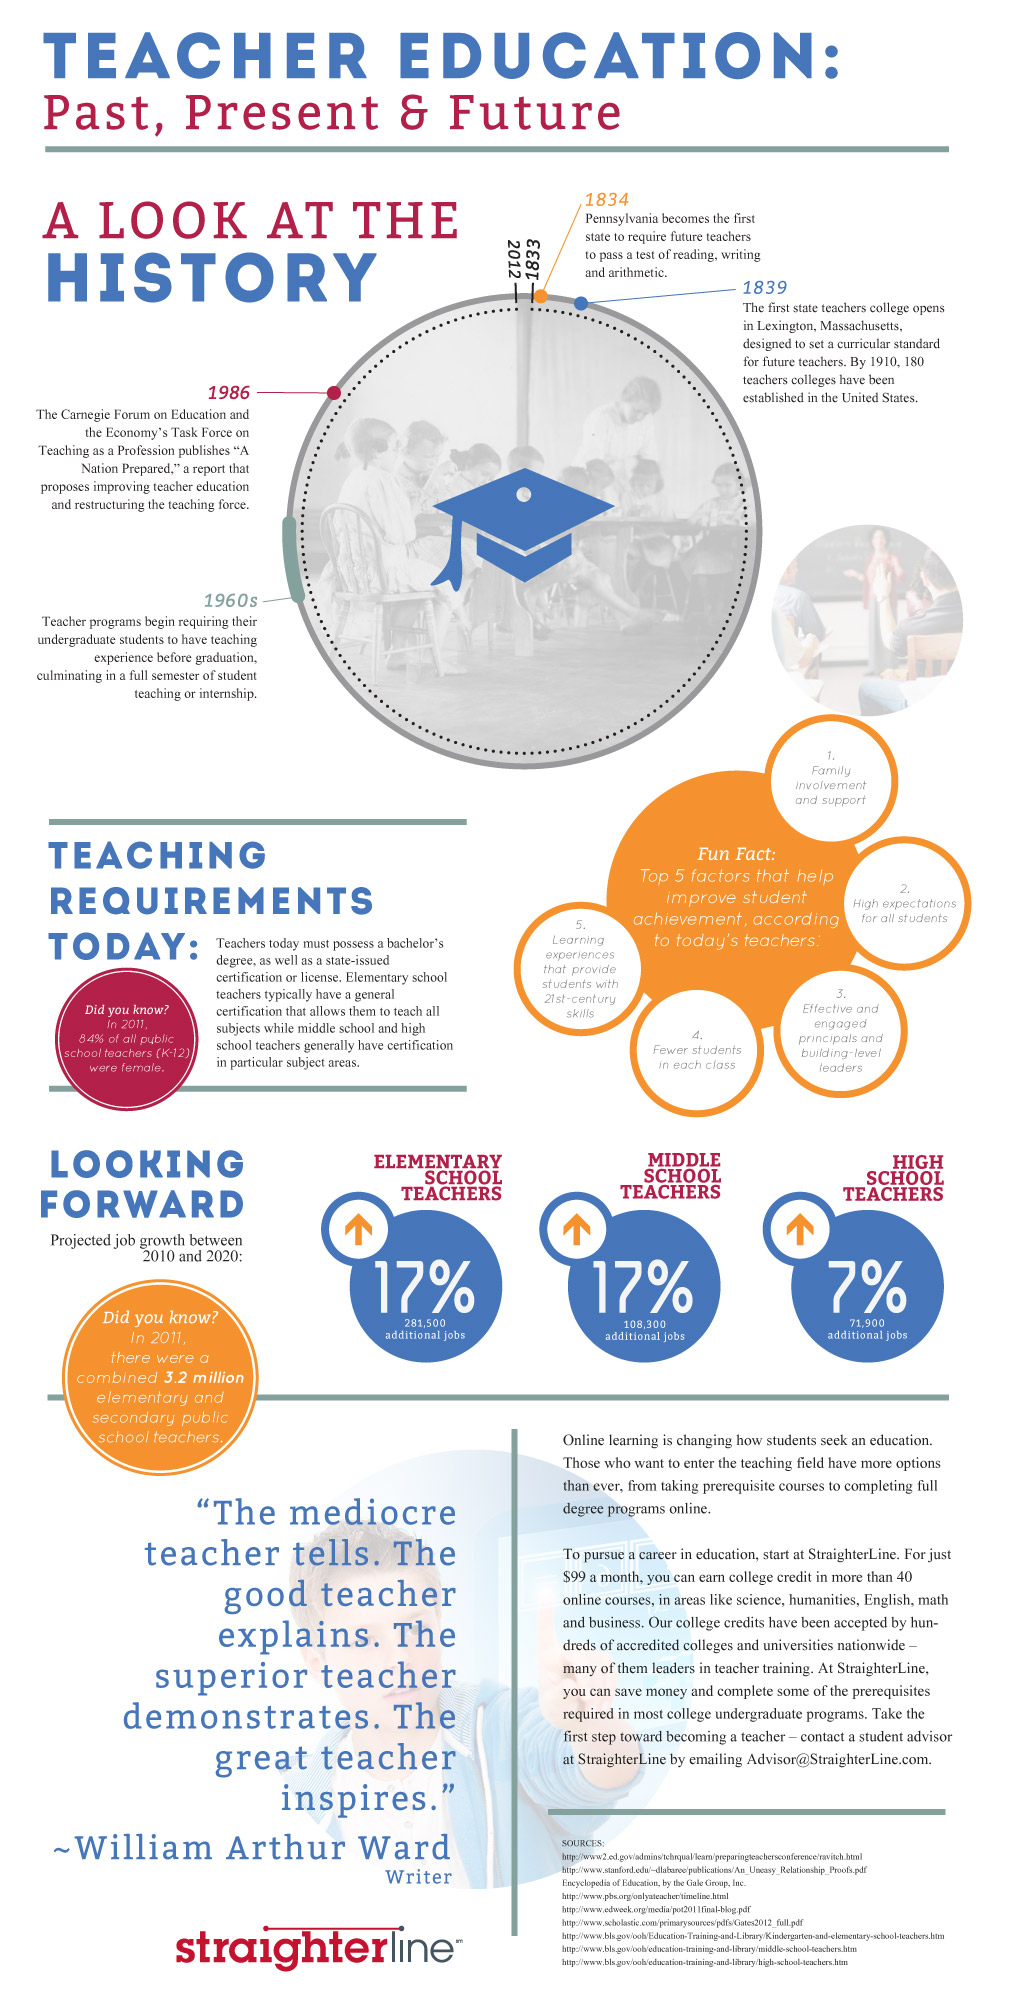 teacher-education-past-present_5085b953cb11b